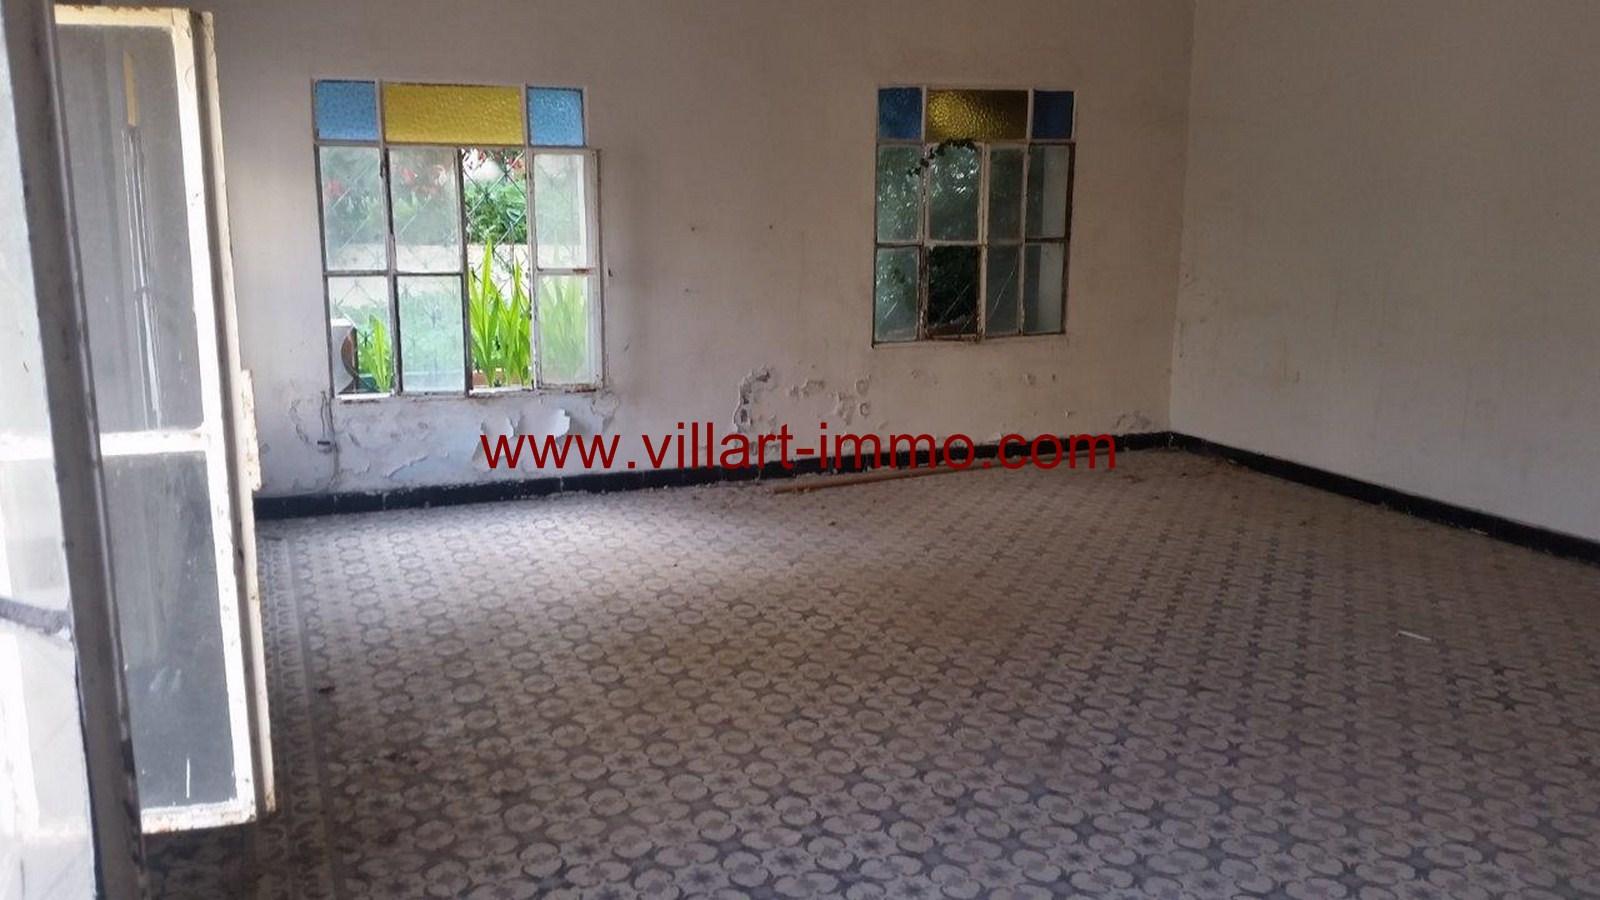 10-vente-maison-tanger-marchan-chambre-3-vm381-villart-immo